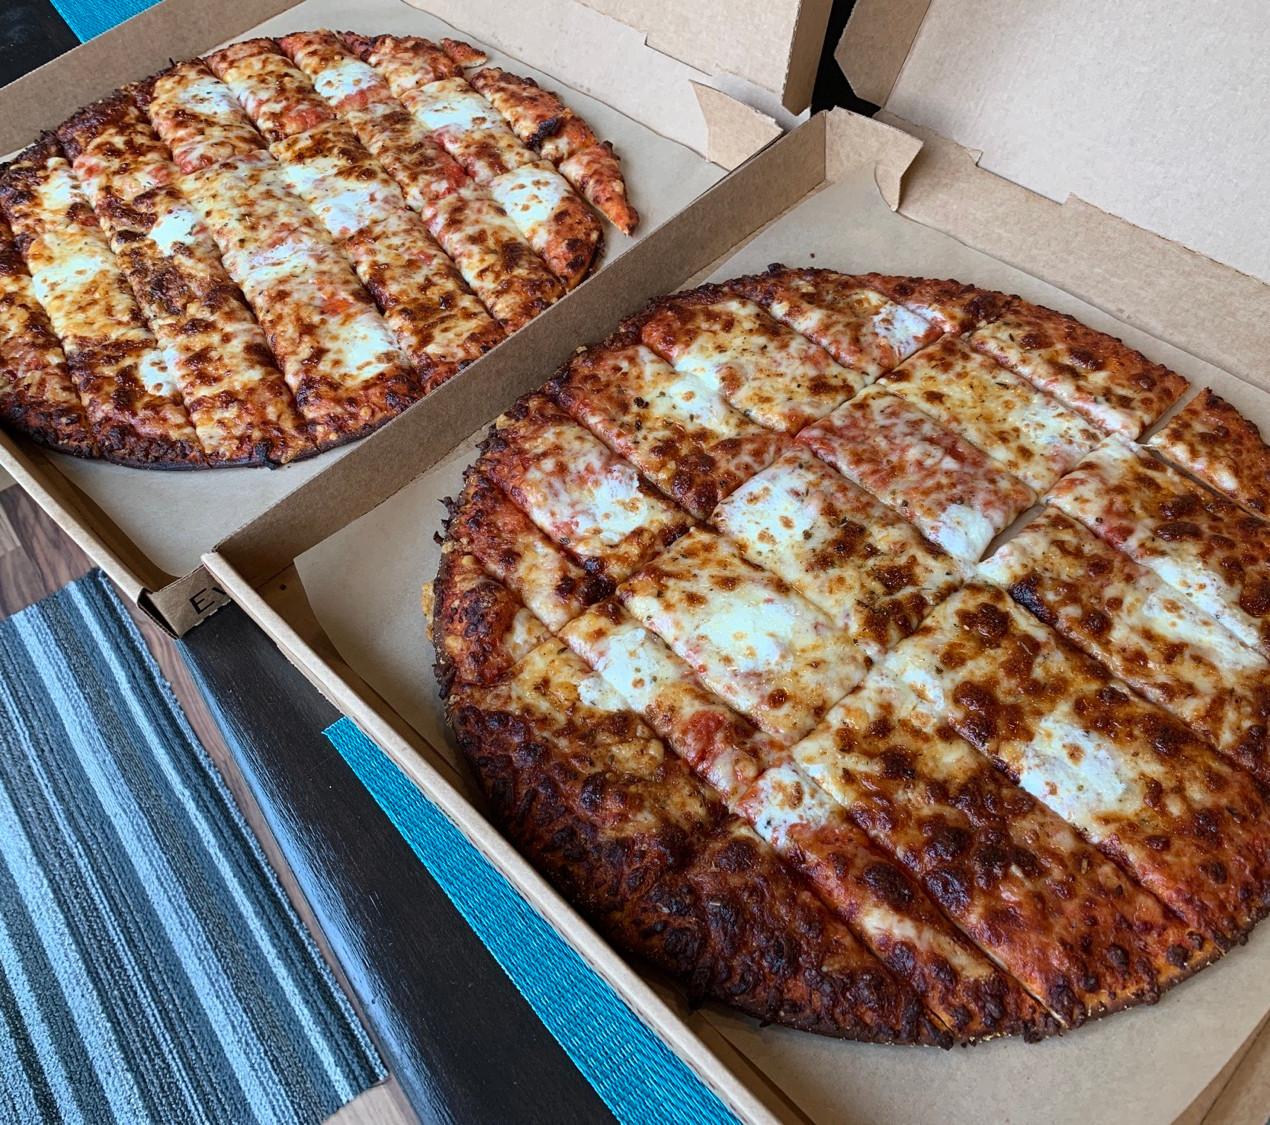 donatos specialty 4 cheese pizza